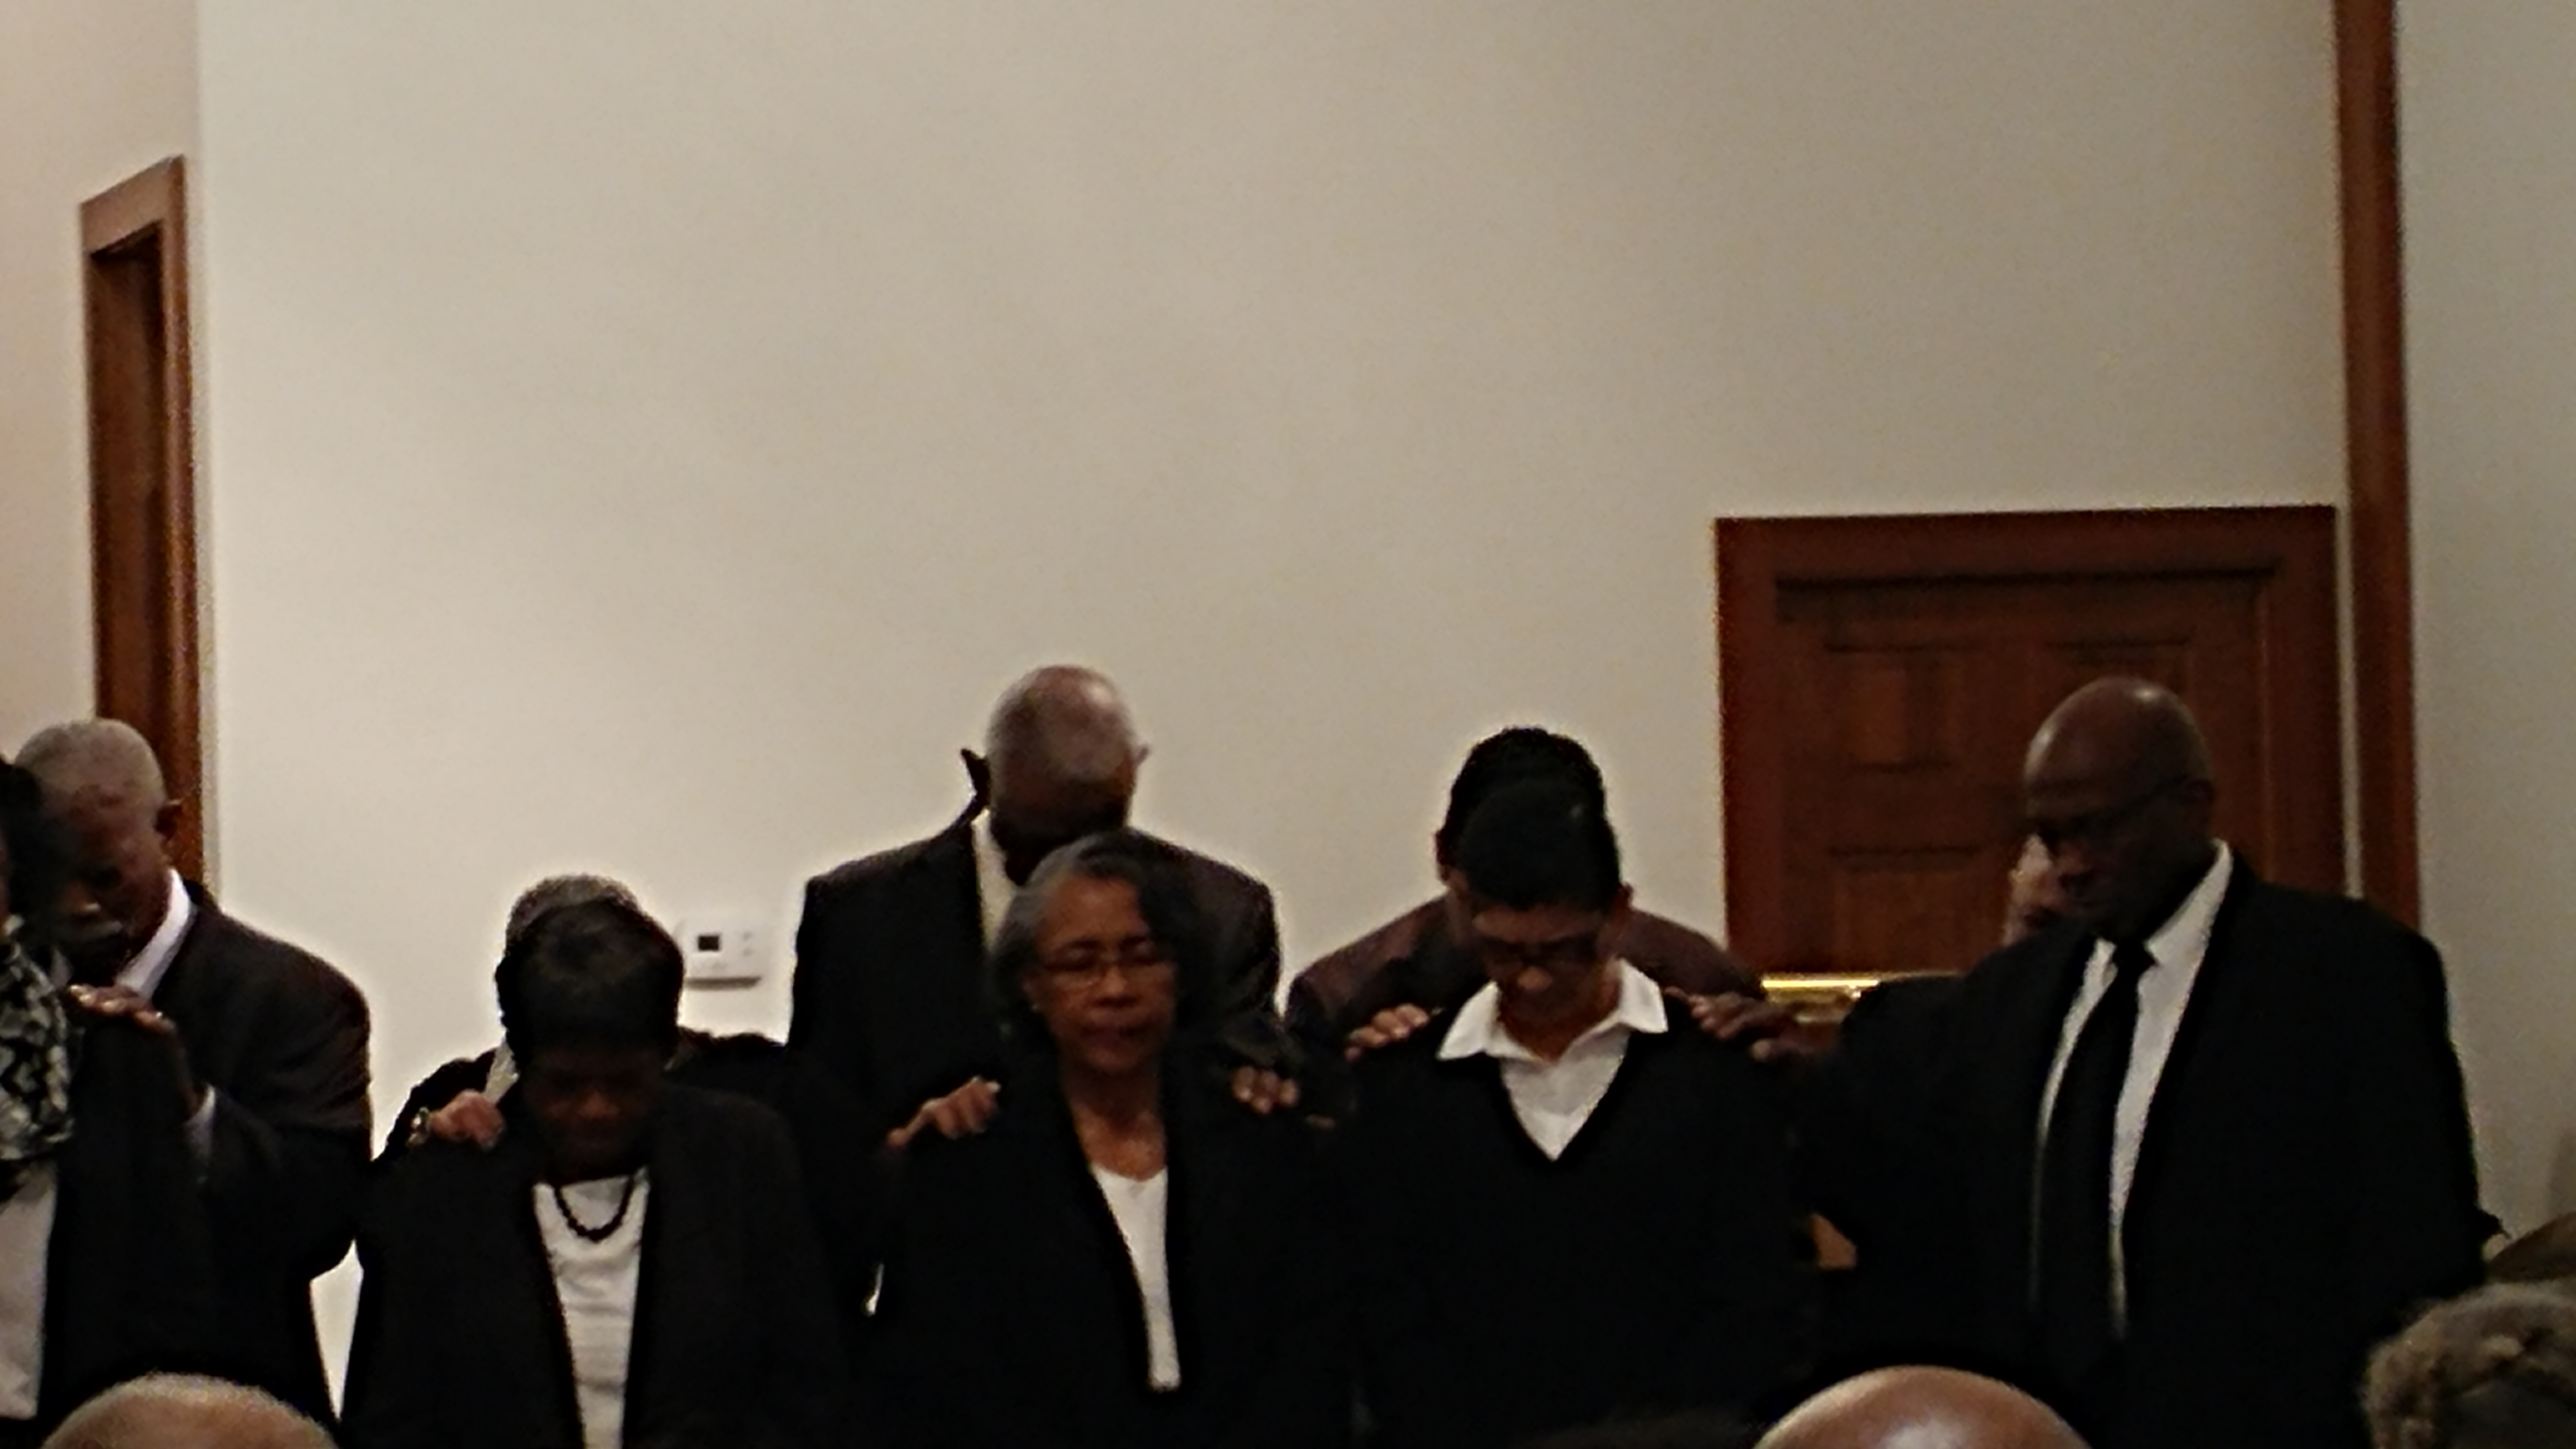 Praying with Candidates